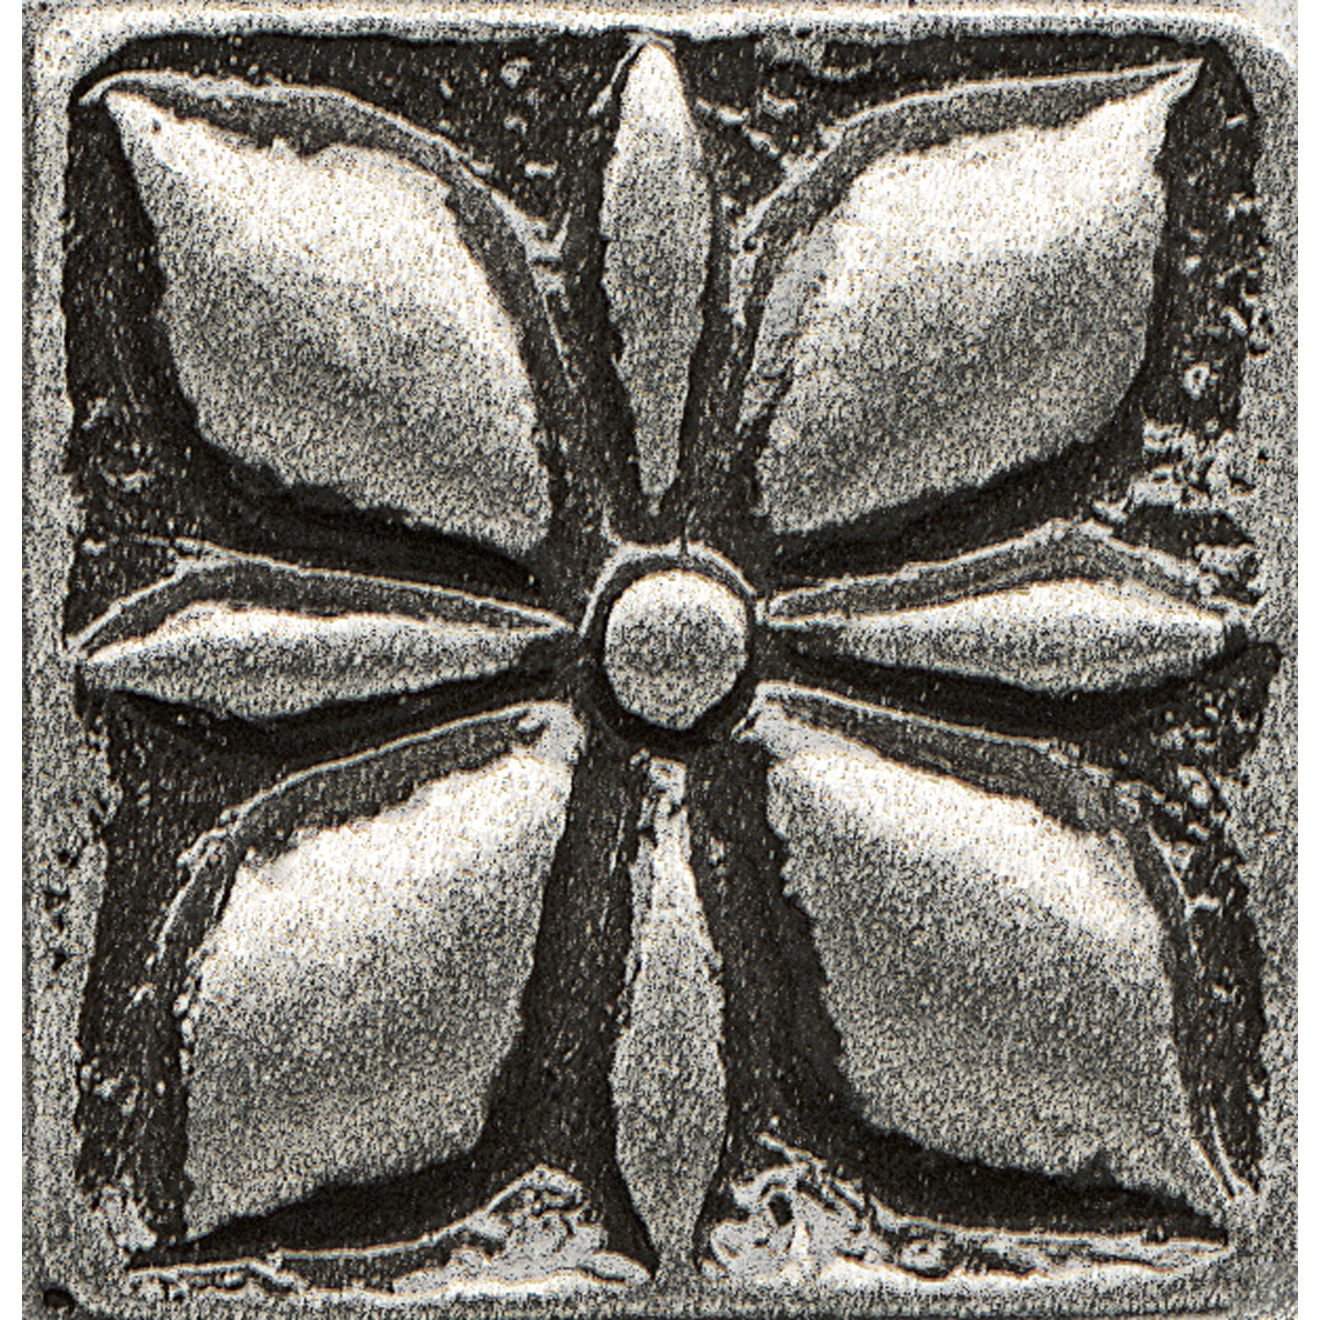 "Ambiance 1"" x 1"" Jasmine Flower Metal Resin Insert in Pewter"